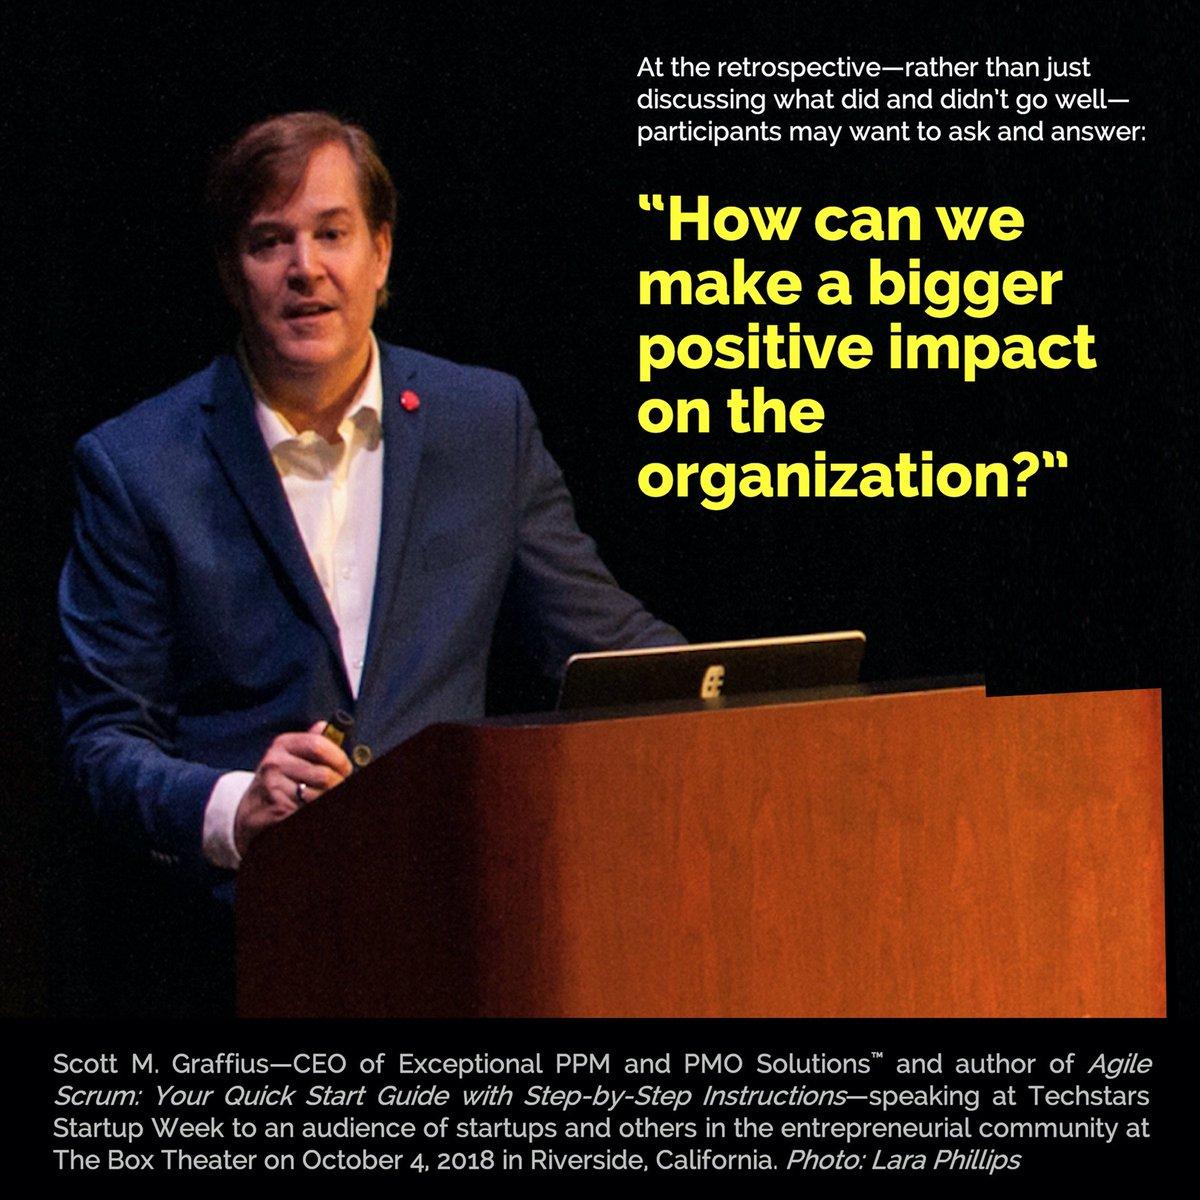 Host Scott M. Graffius at your event. Visit http://bit.ly/speakerone to learn more.  #agile #projectmanagement #PPM #PMO #ePMO #theprojecteconomy #startup #startups #innovation #product #development #success #growth #speaker #publicspeaker #keynote #conference #keynotespeaker .pic.twitter.com/epTfwkbtcm